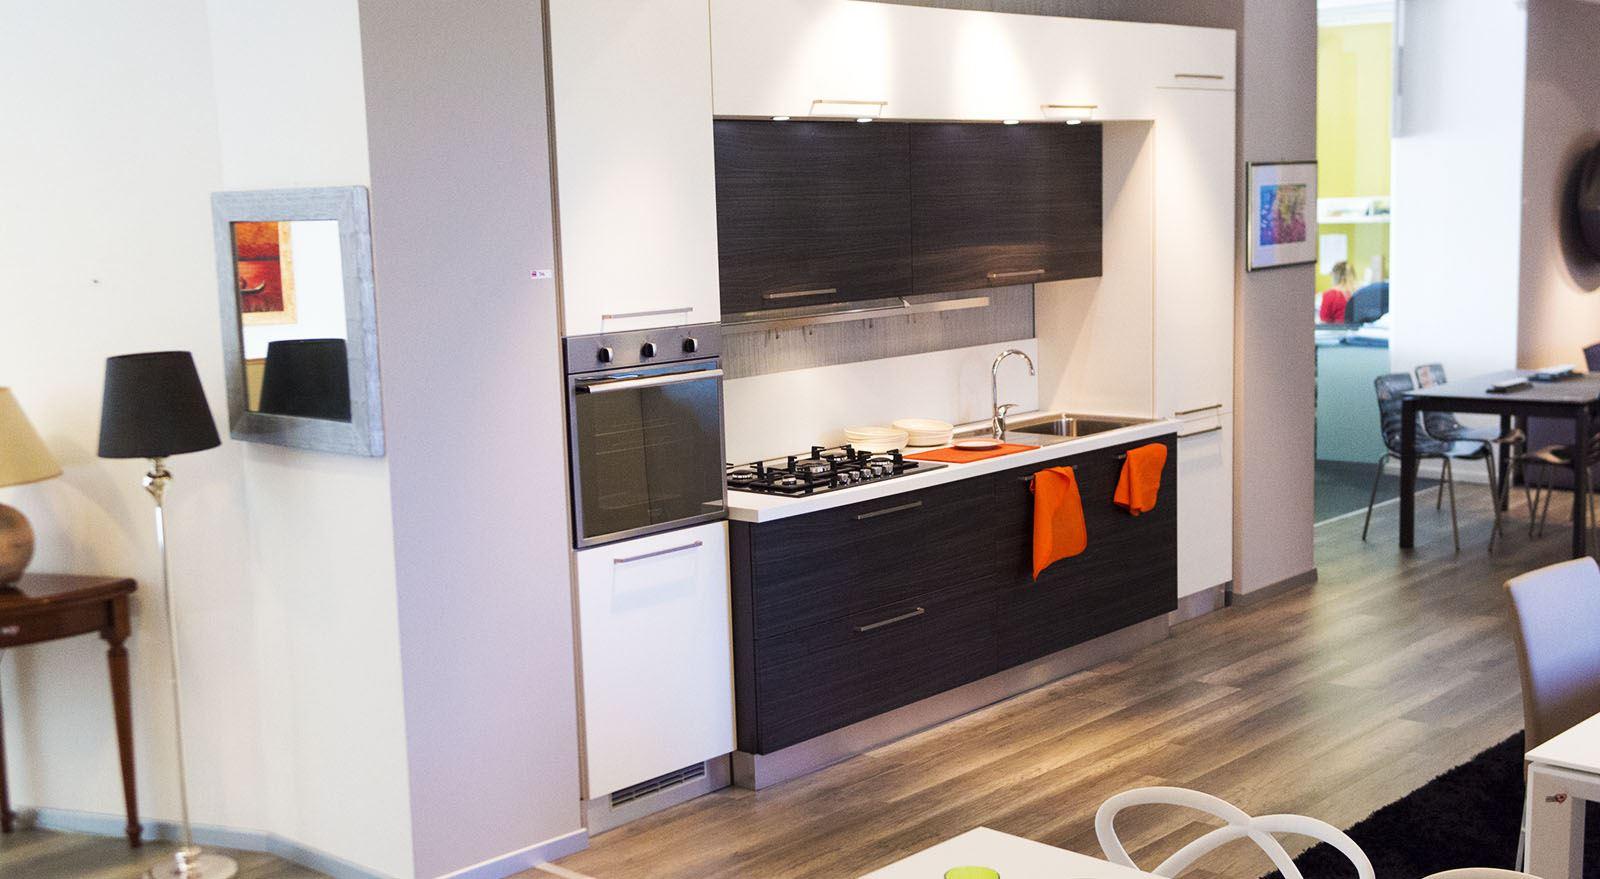 Outlet cucine padova da arredamenti meneghello for Offerte cucine moderne